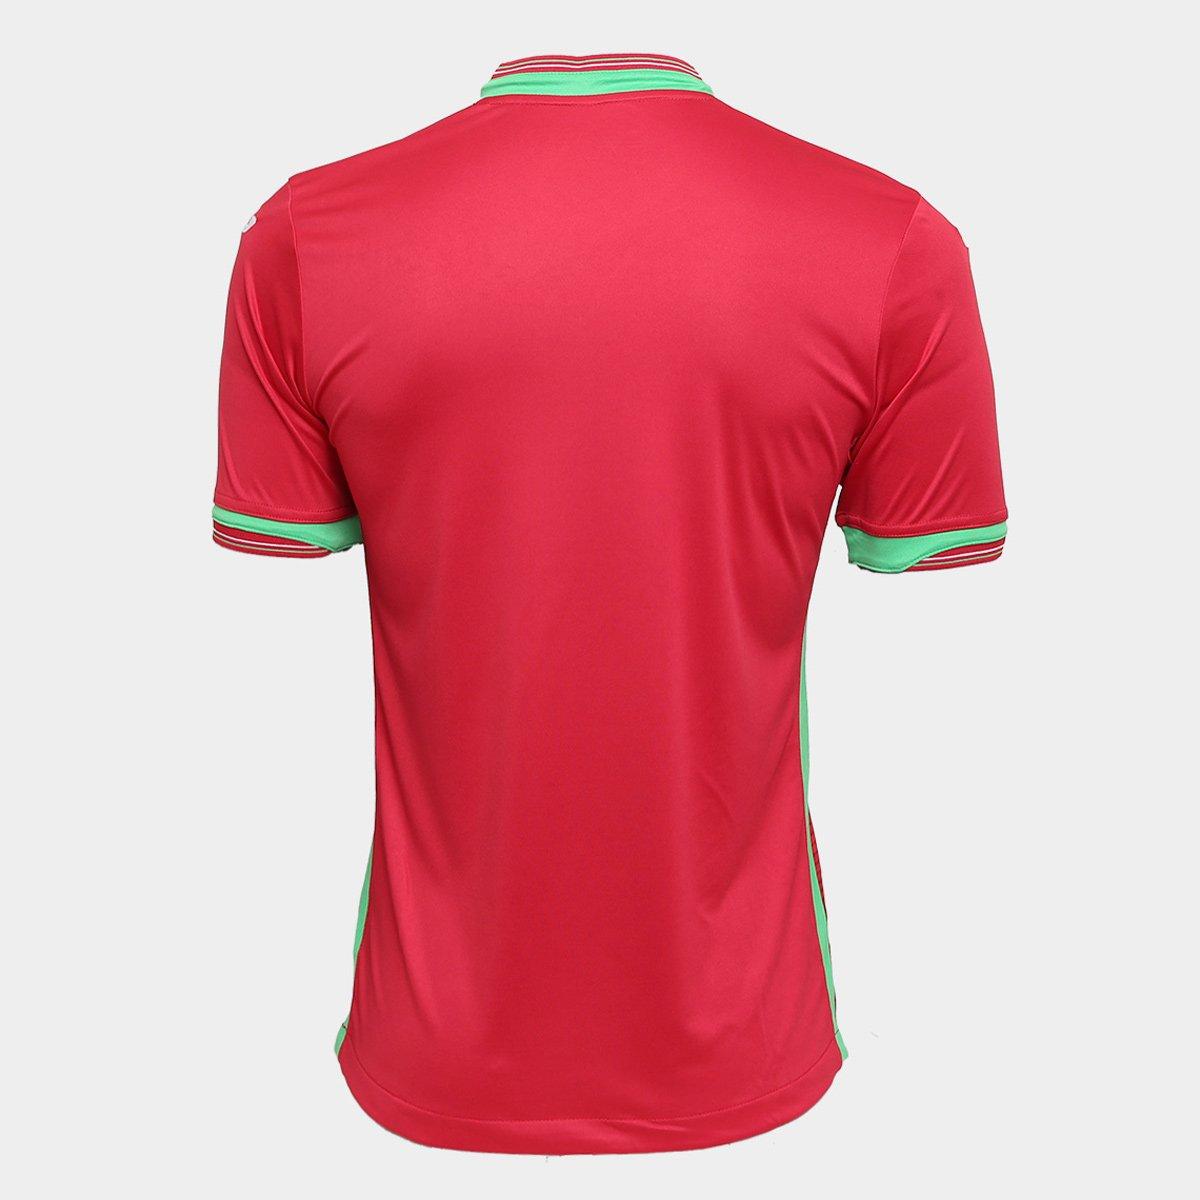 ... Camisa Swansea City Away 17 18 s n°- Torcedor Joma Masculina ... 7f59850fe769d